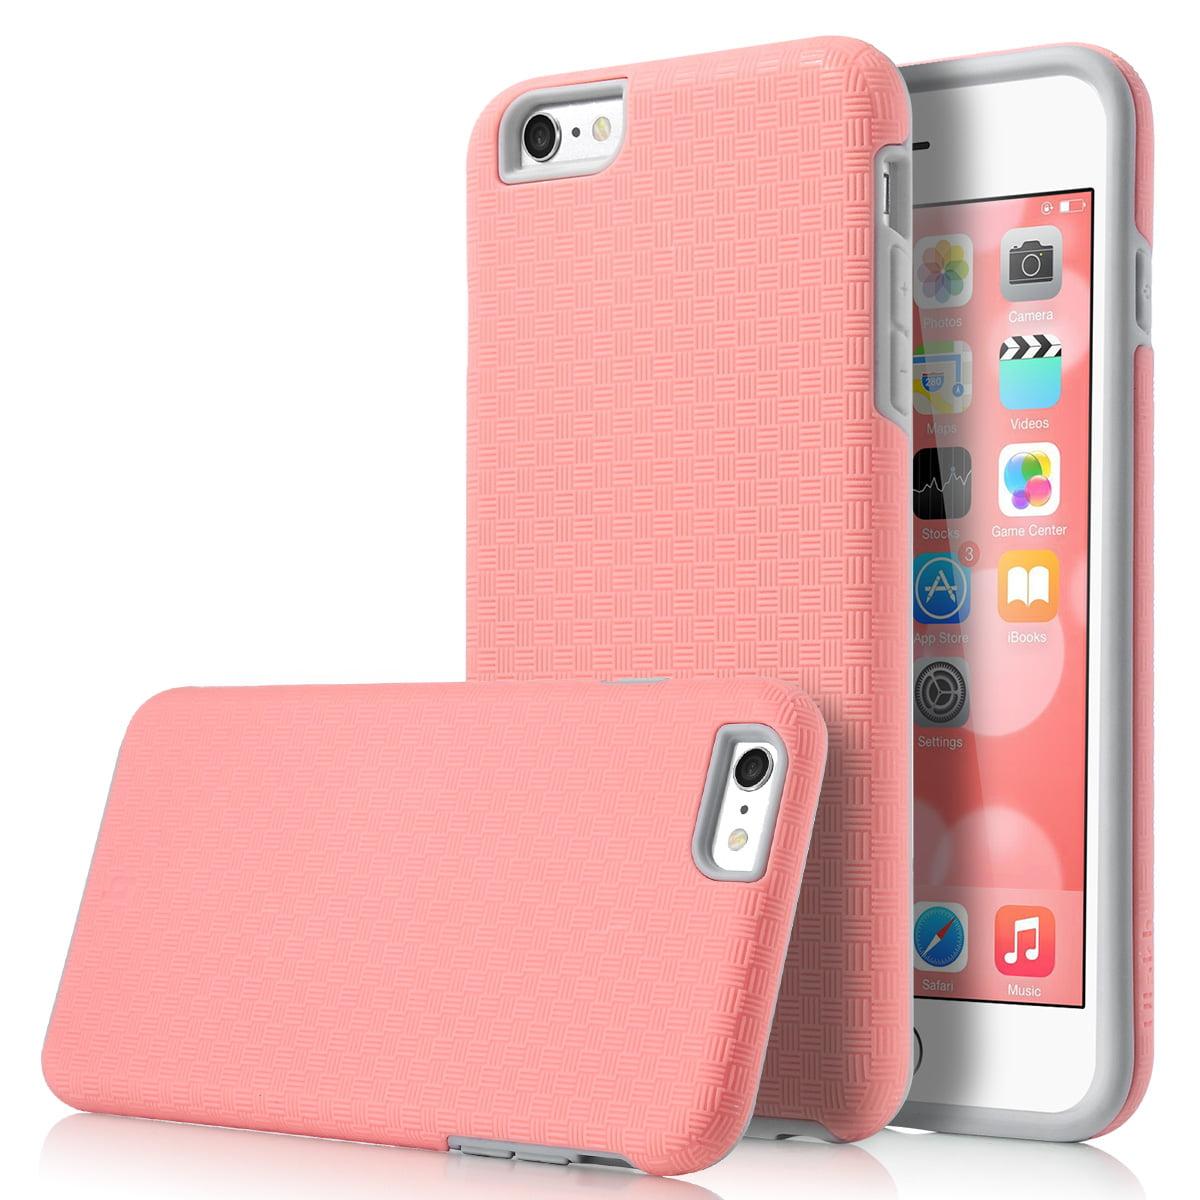 sale retailer 26ec3 18bec iPhone 6s Plus Case, iPhone 6 Plus Case, ULAK Slim Protective Shock  Absorbent TPU Bumper Hard Cover for Apple iPhone 6 Plus /6s Plus 5.5 inch,  Light ...